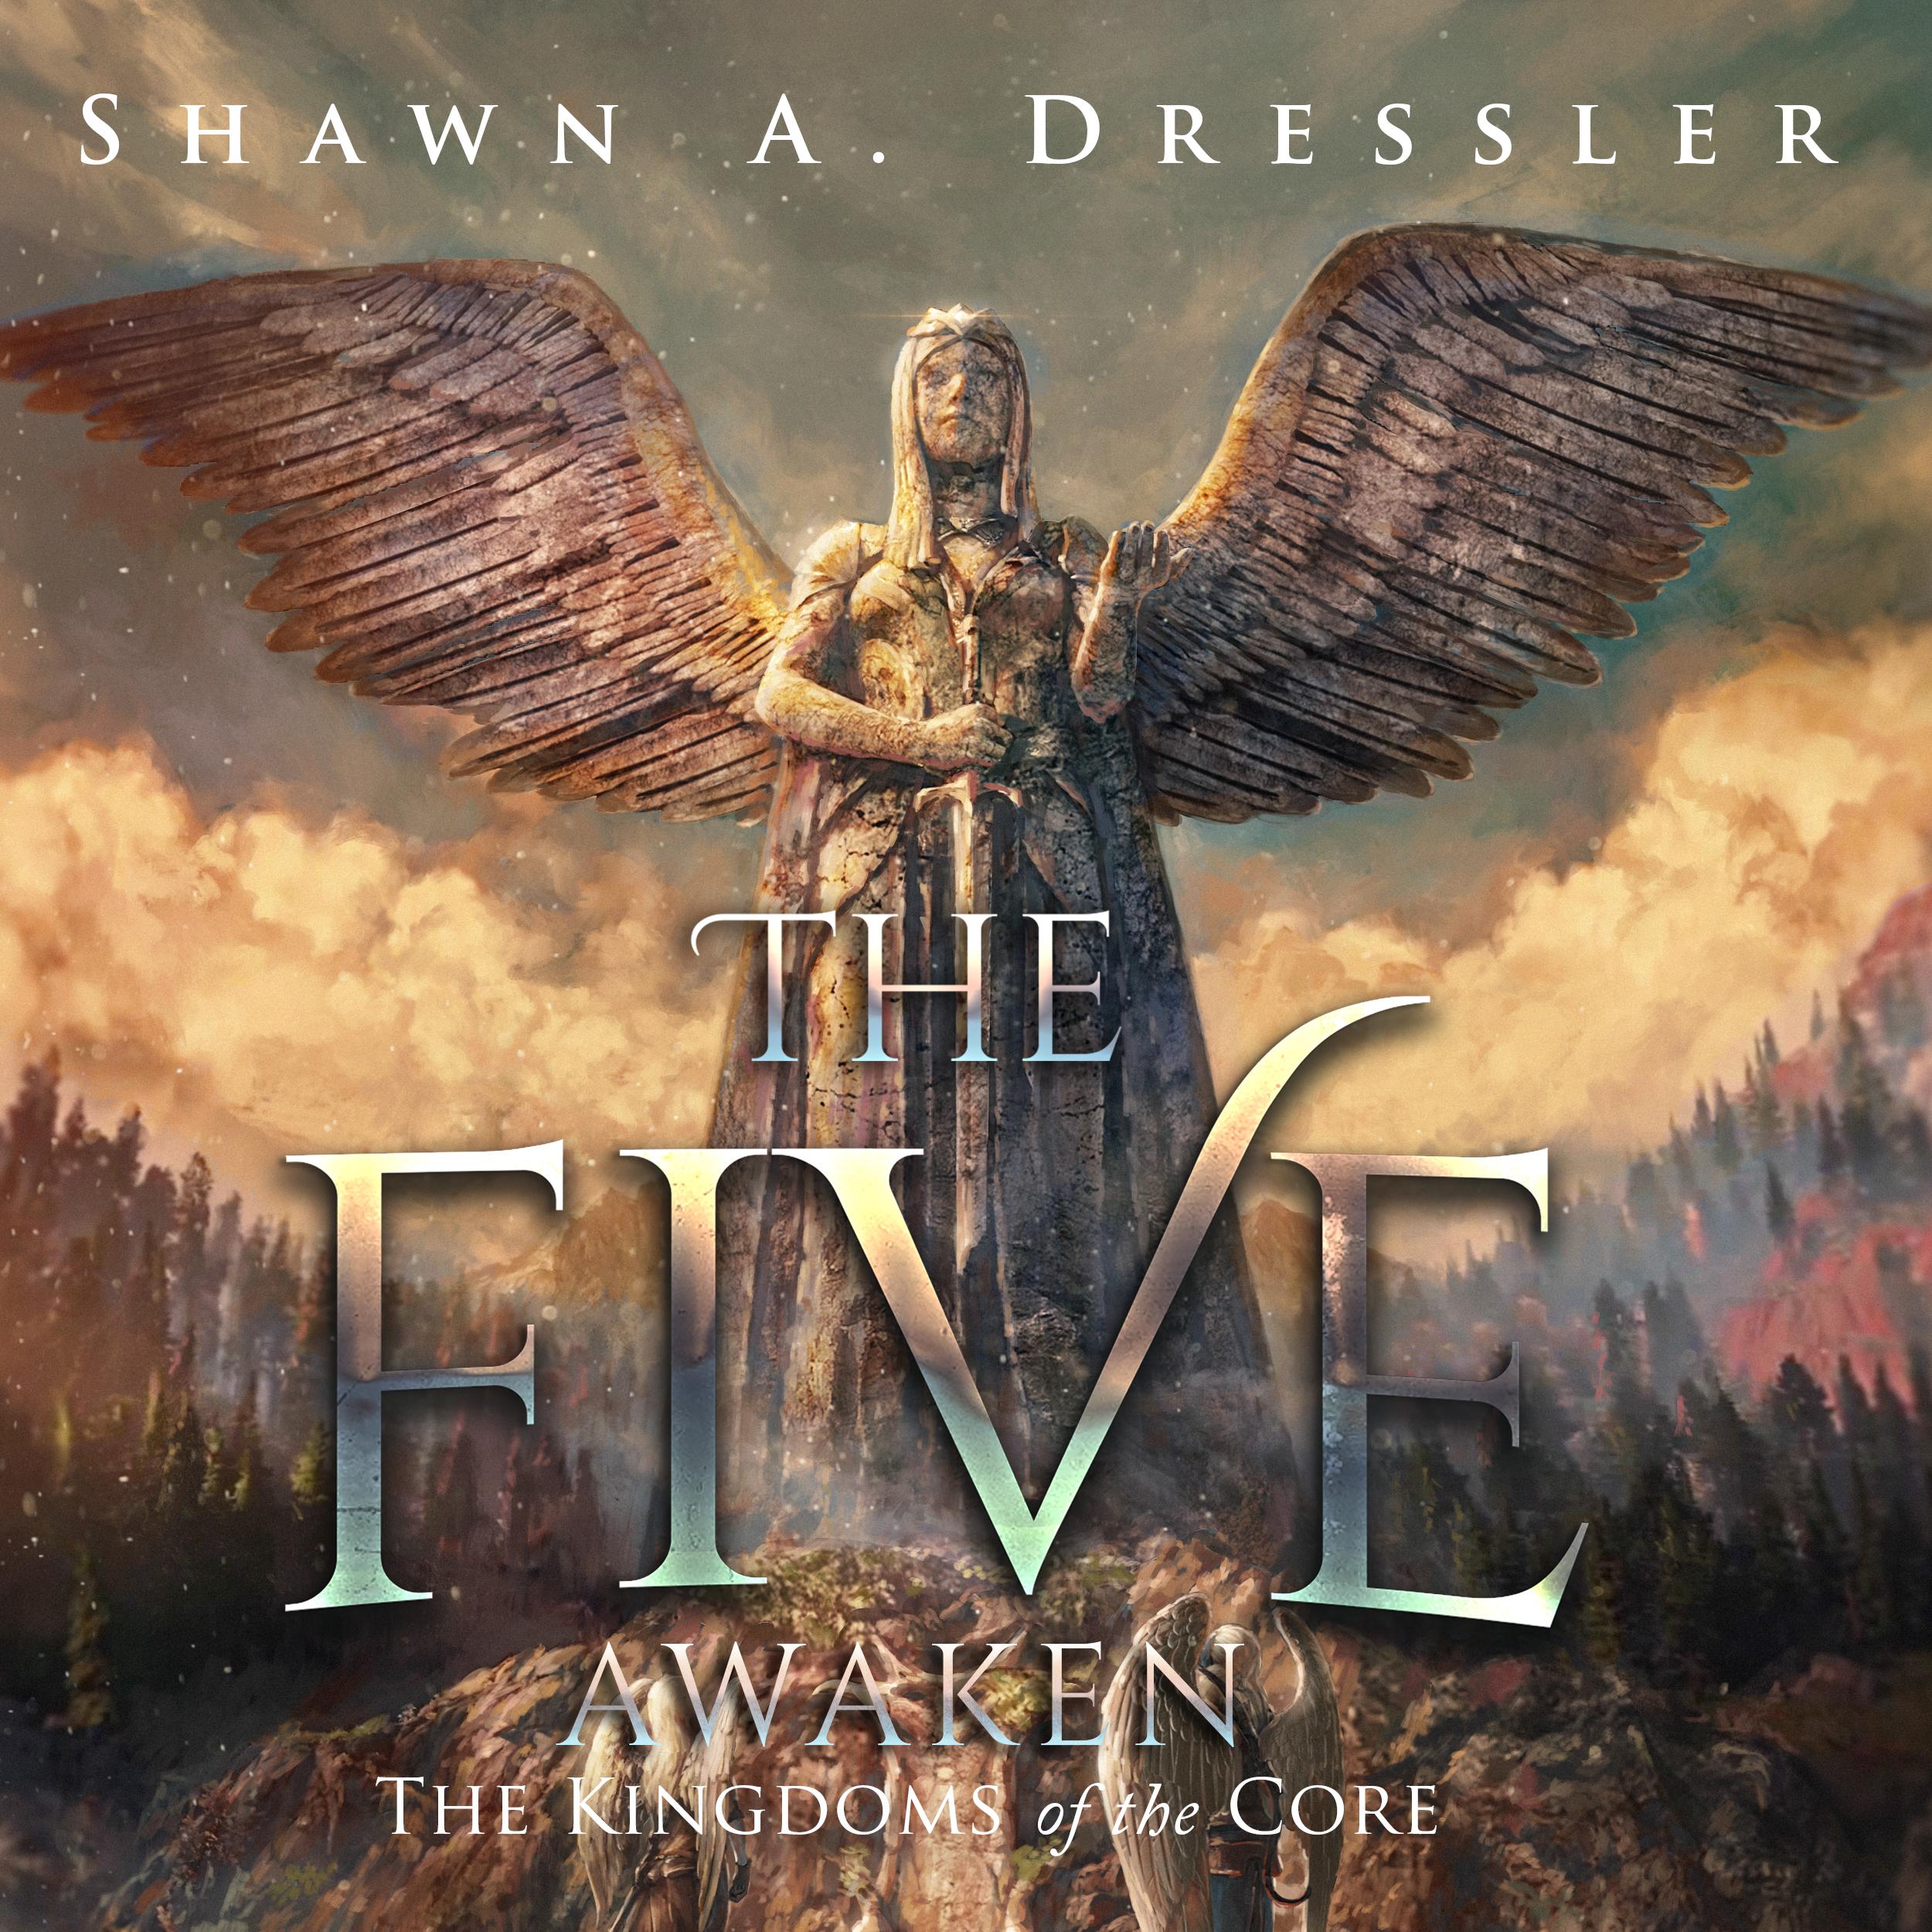 Shawn A. Dressler – Author